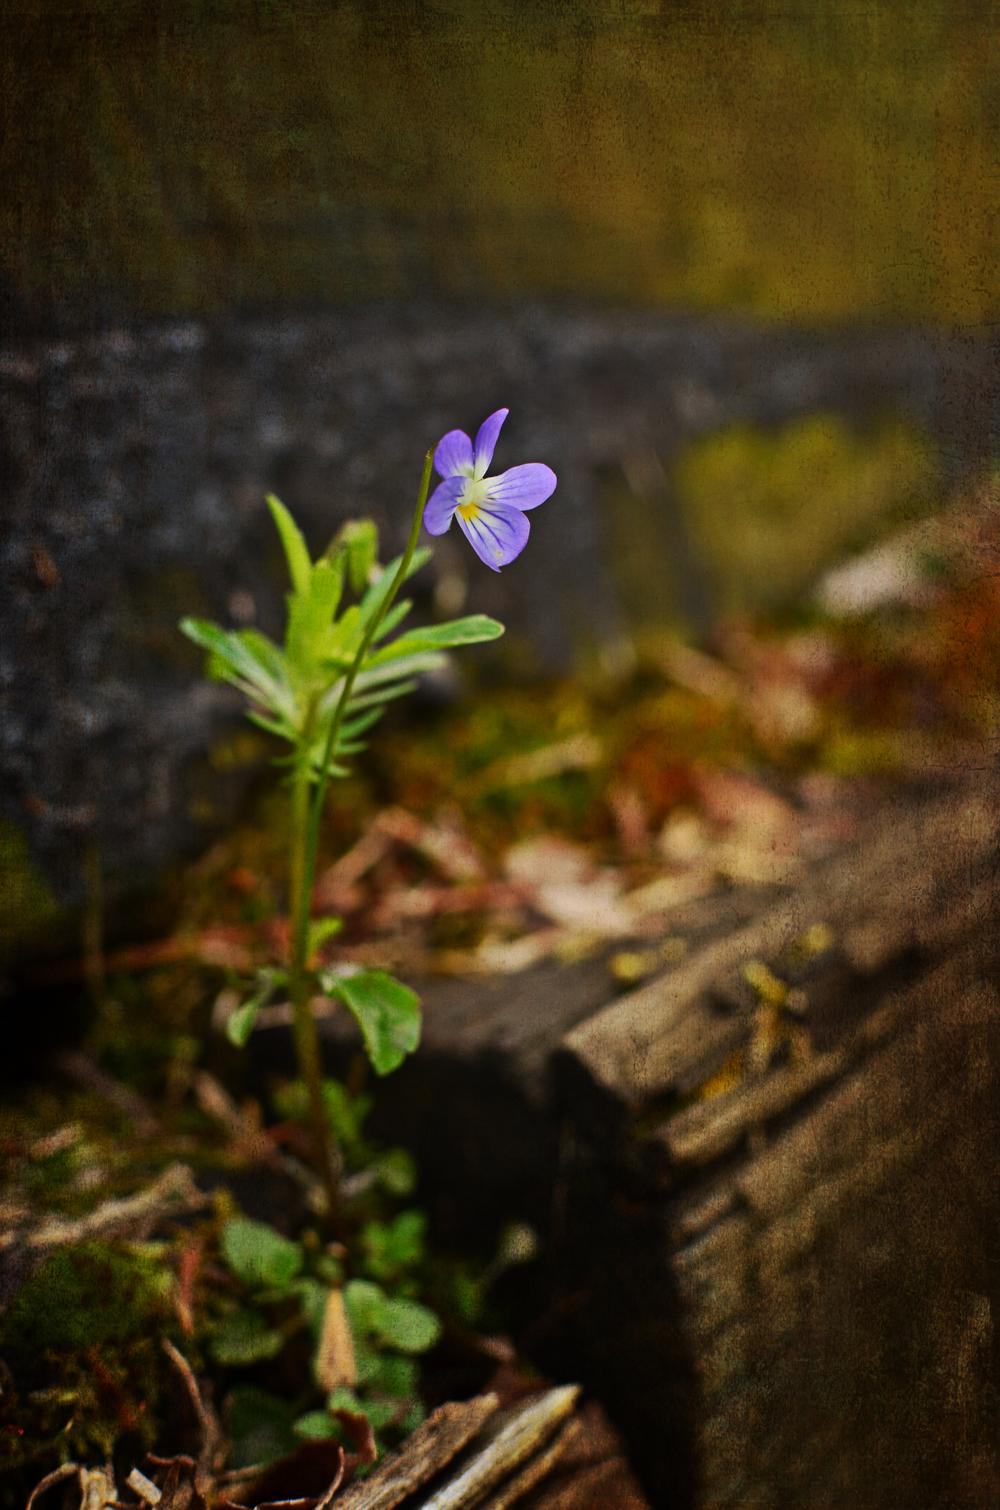 Flower on a ledge